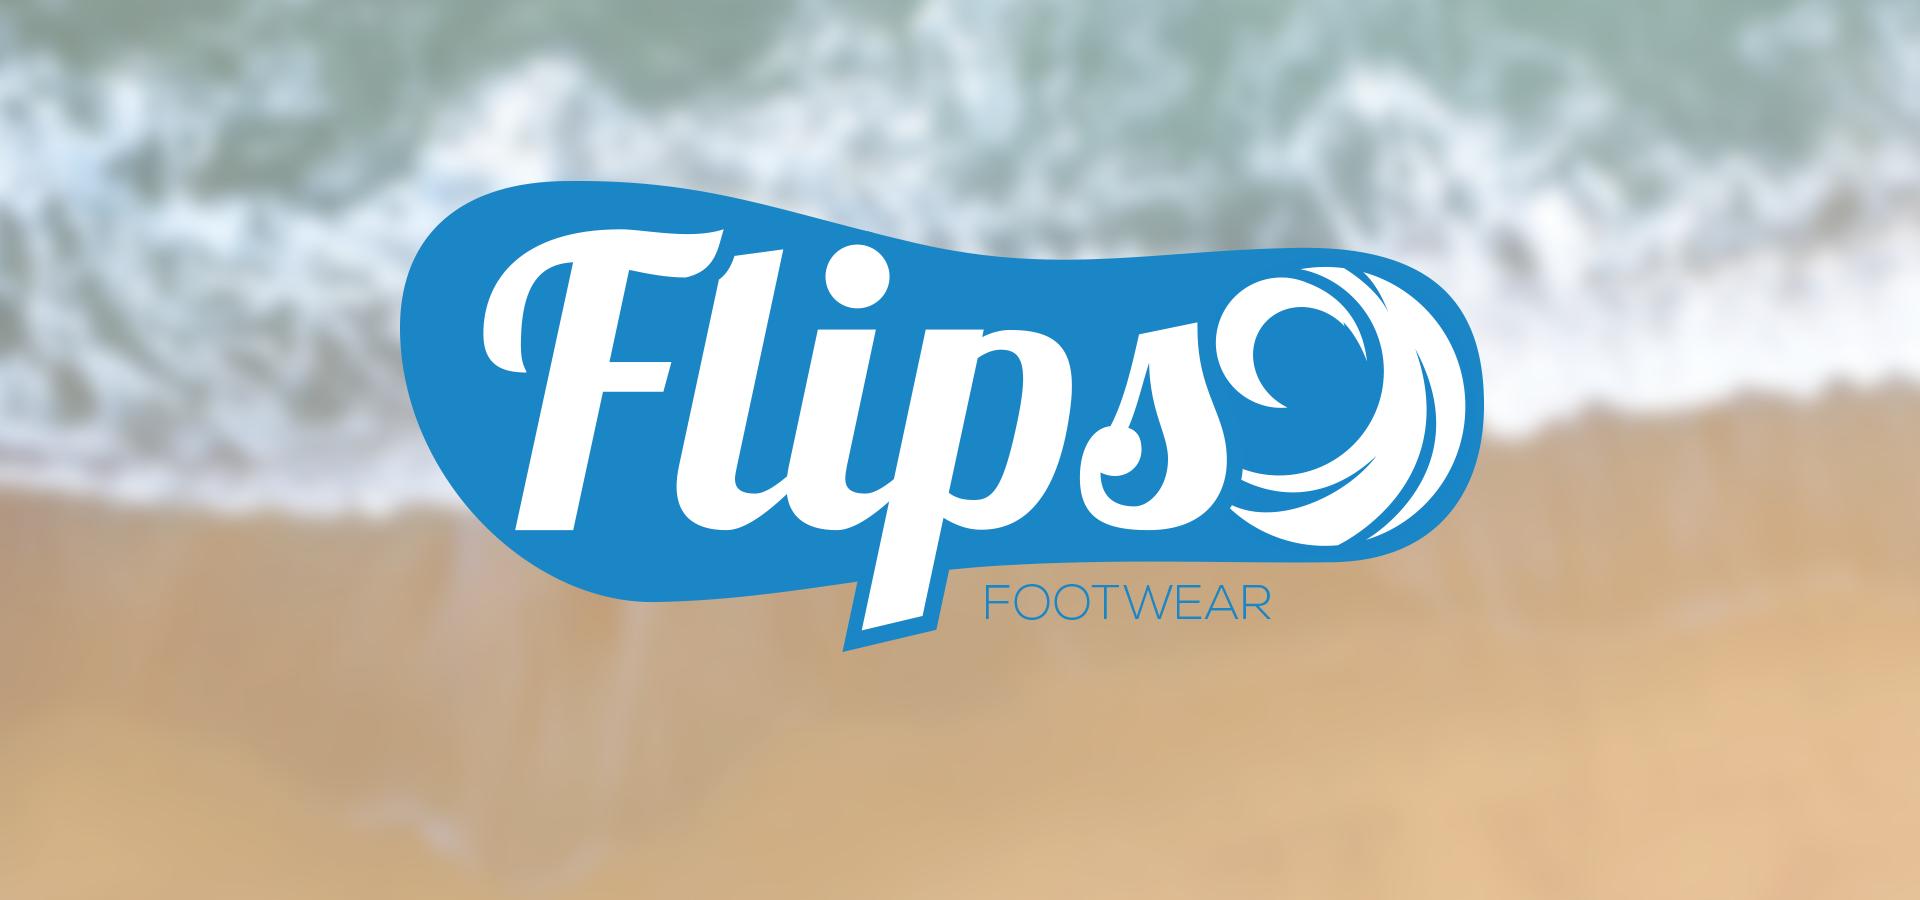 Flips logo main page image